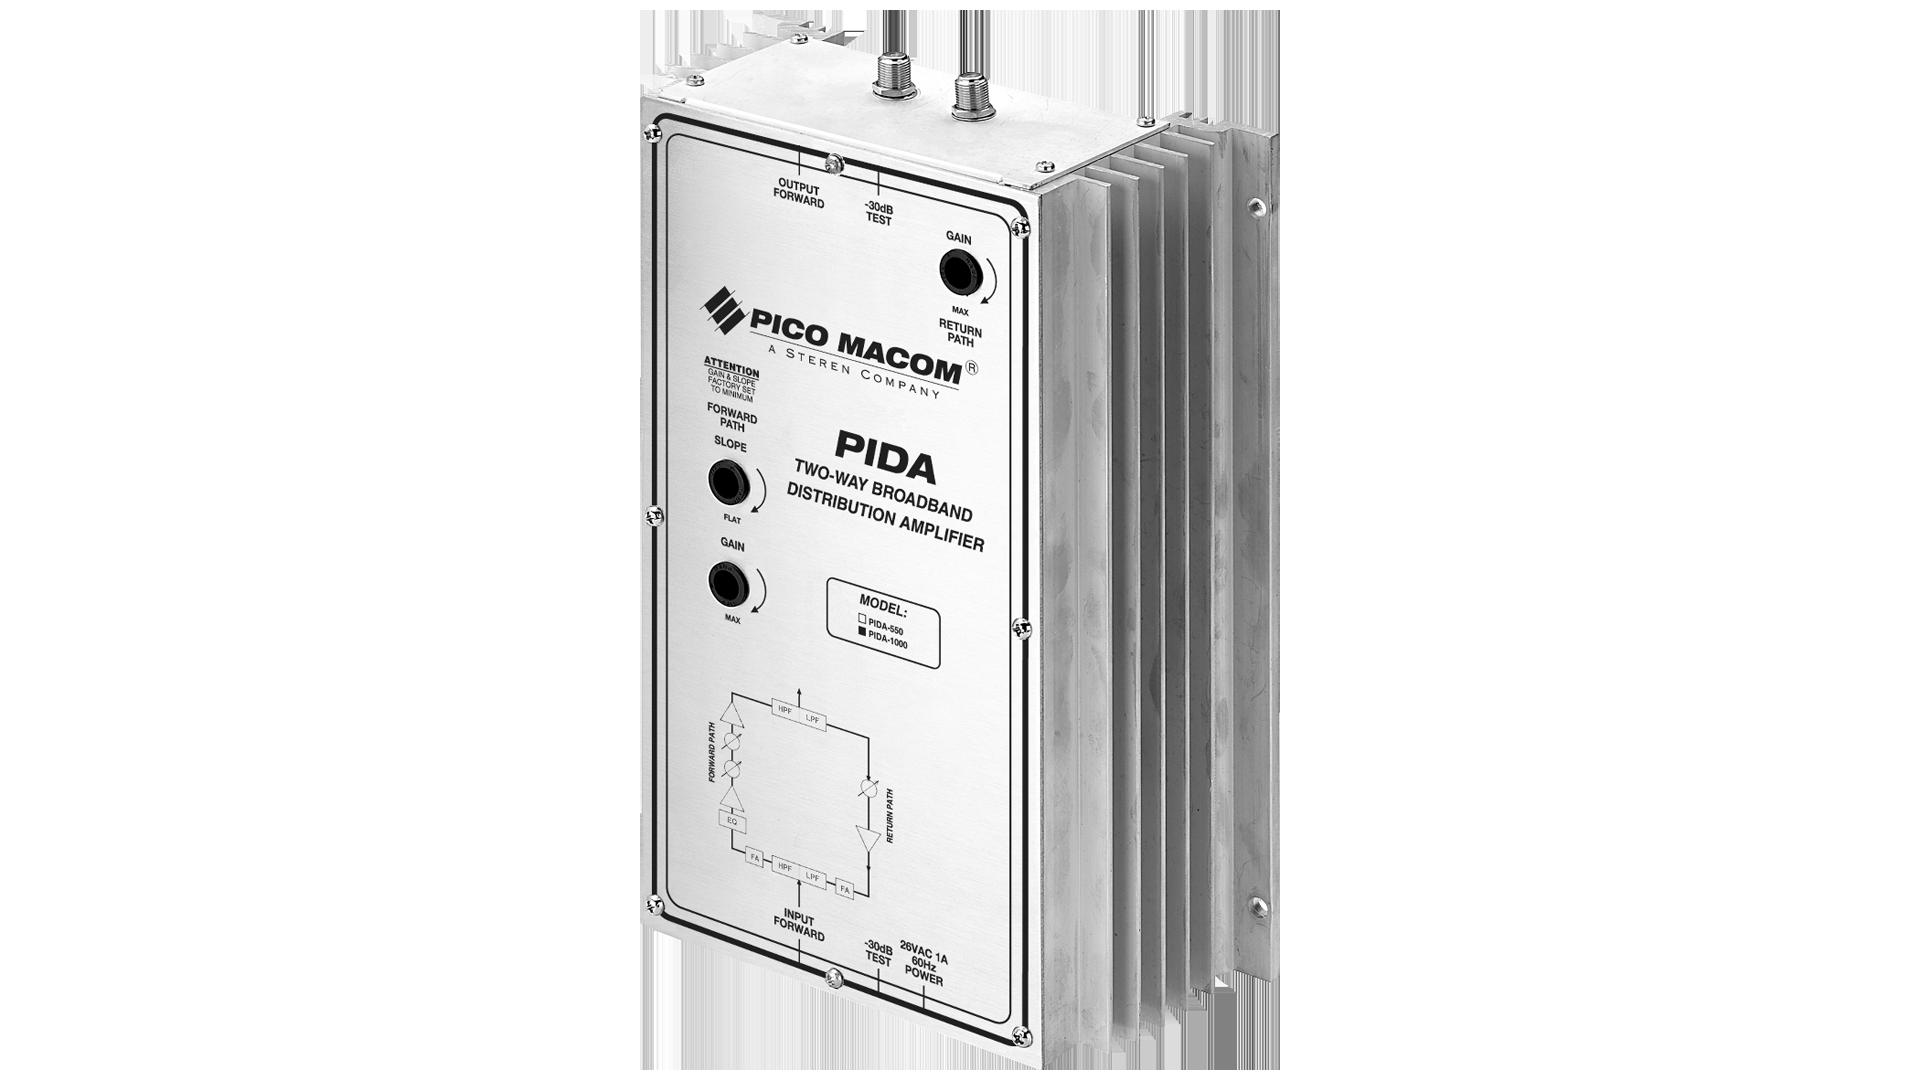 PIDA-1000: Broadband Bi-directional Push-Pull Distribution Amplifiers